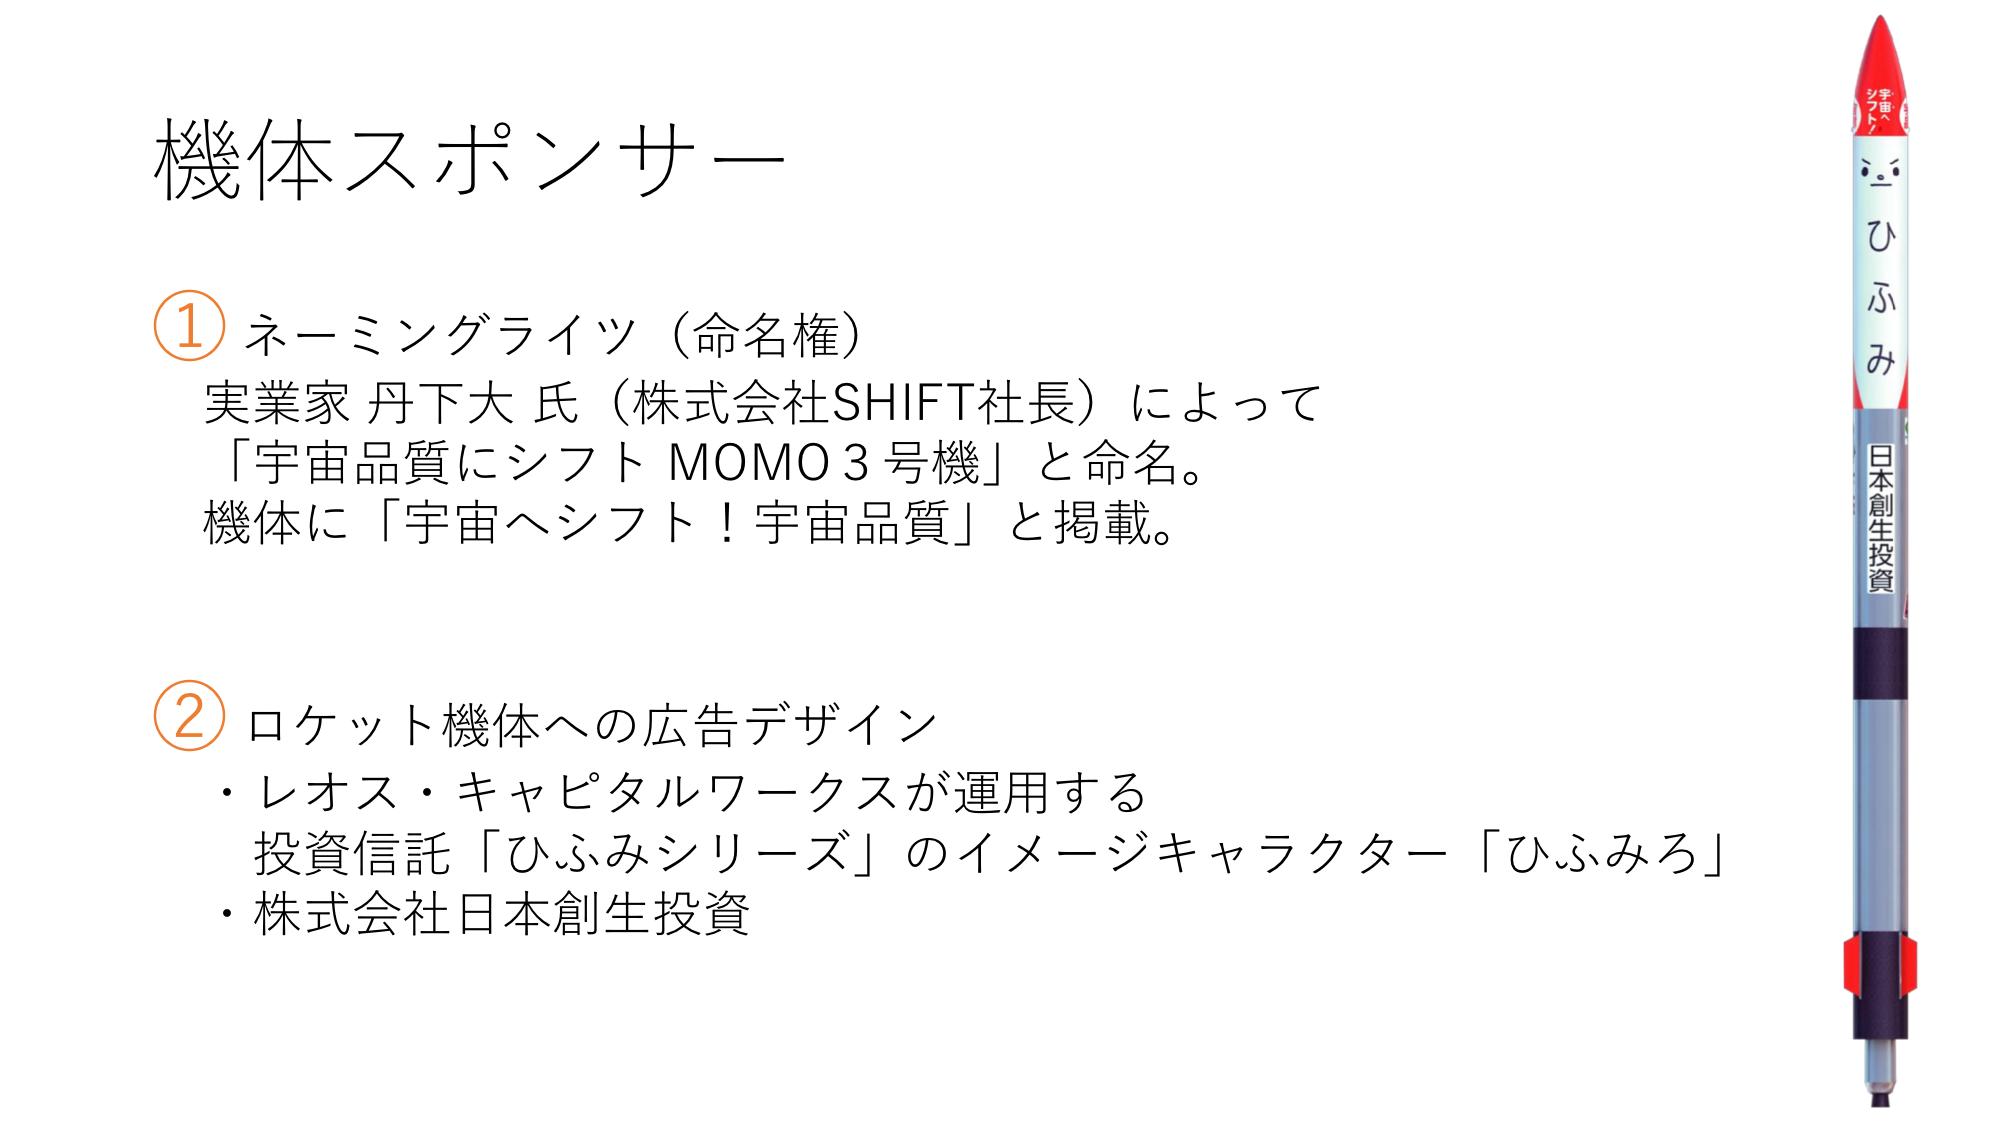 f:id:Imamura:20190414213959p:plain